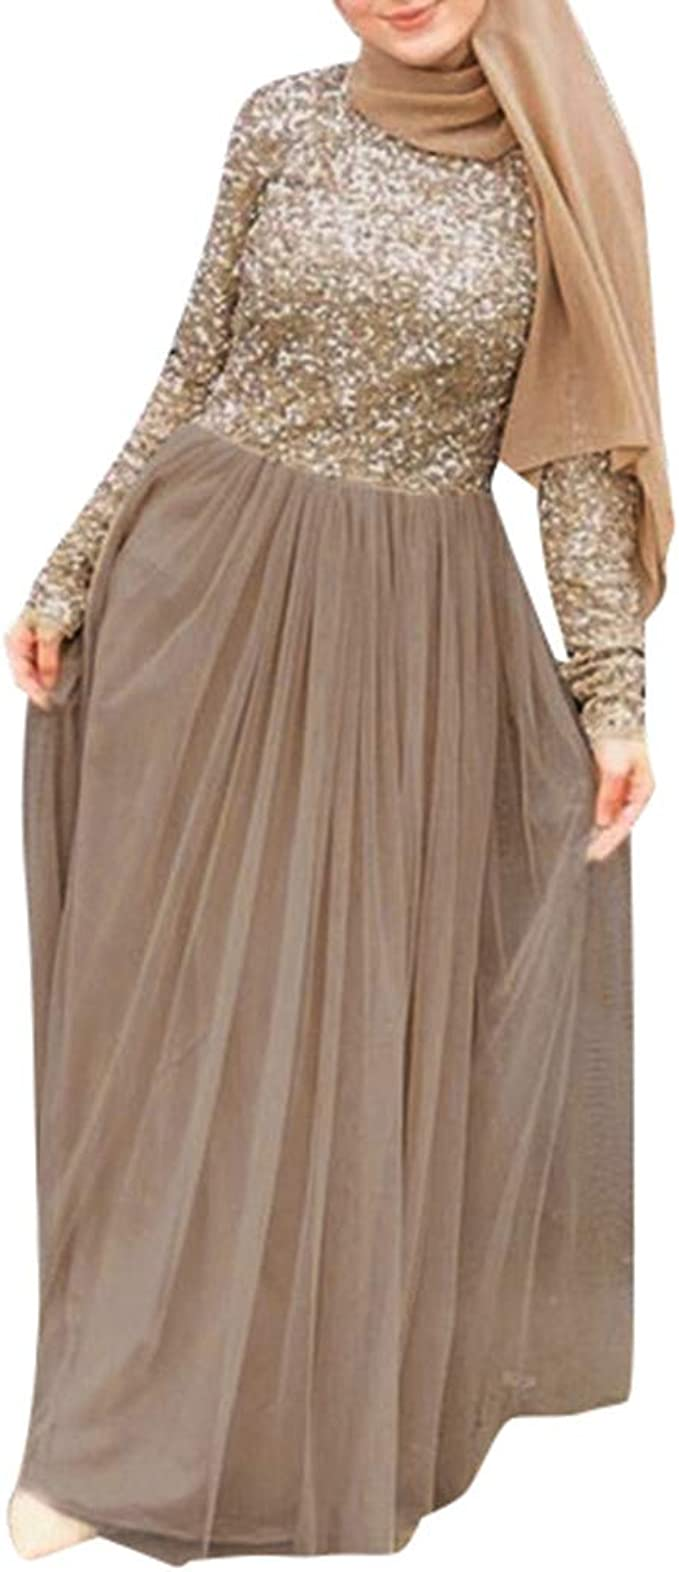 Women_Dress Wong Faldas largas de Lentejuelas para Mujer, Elegante ...